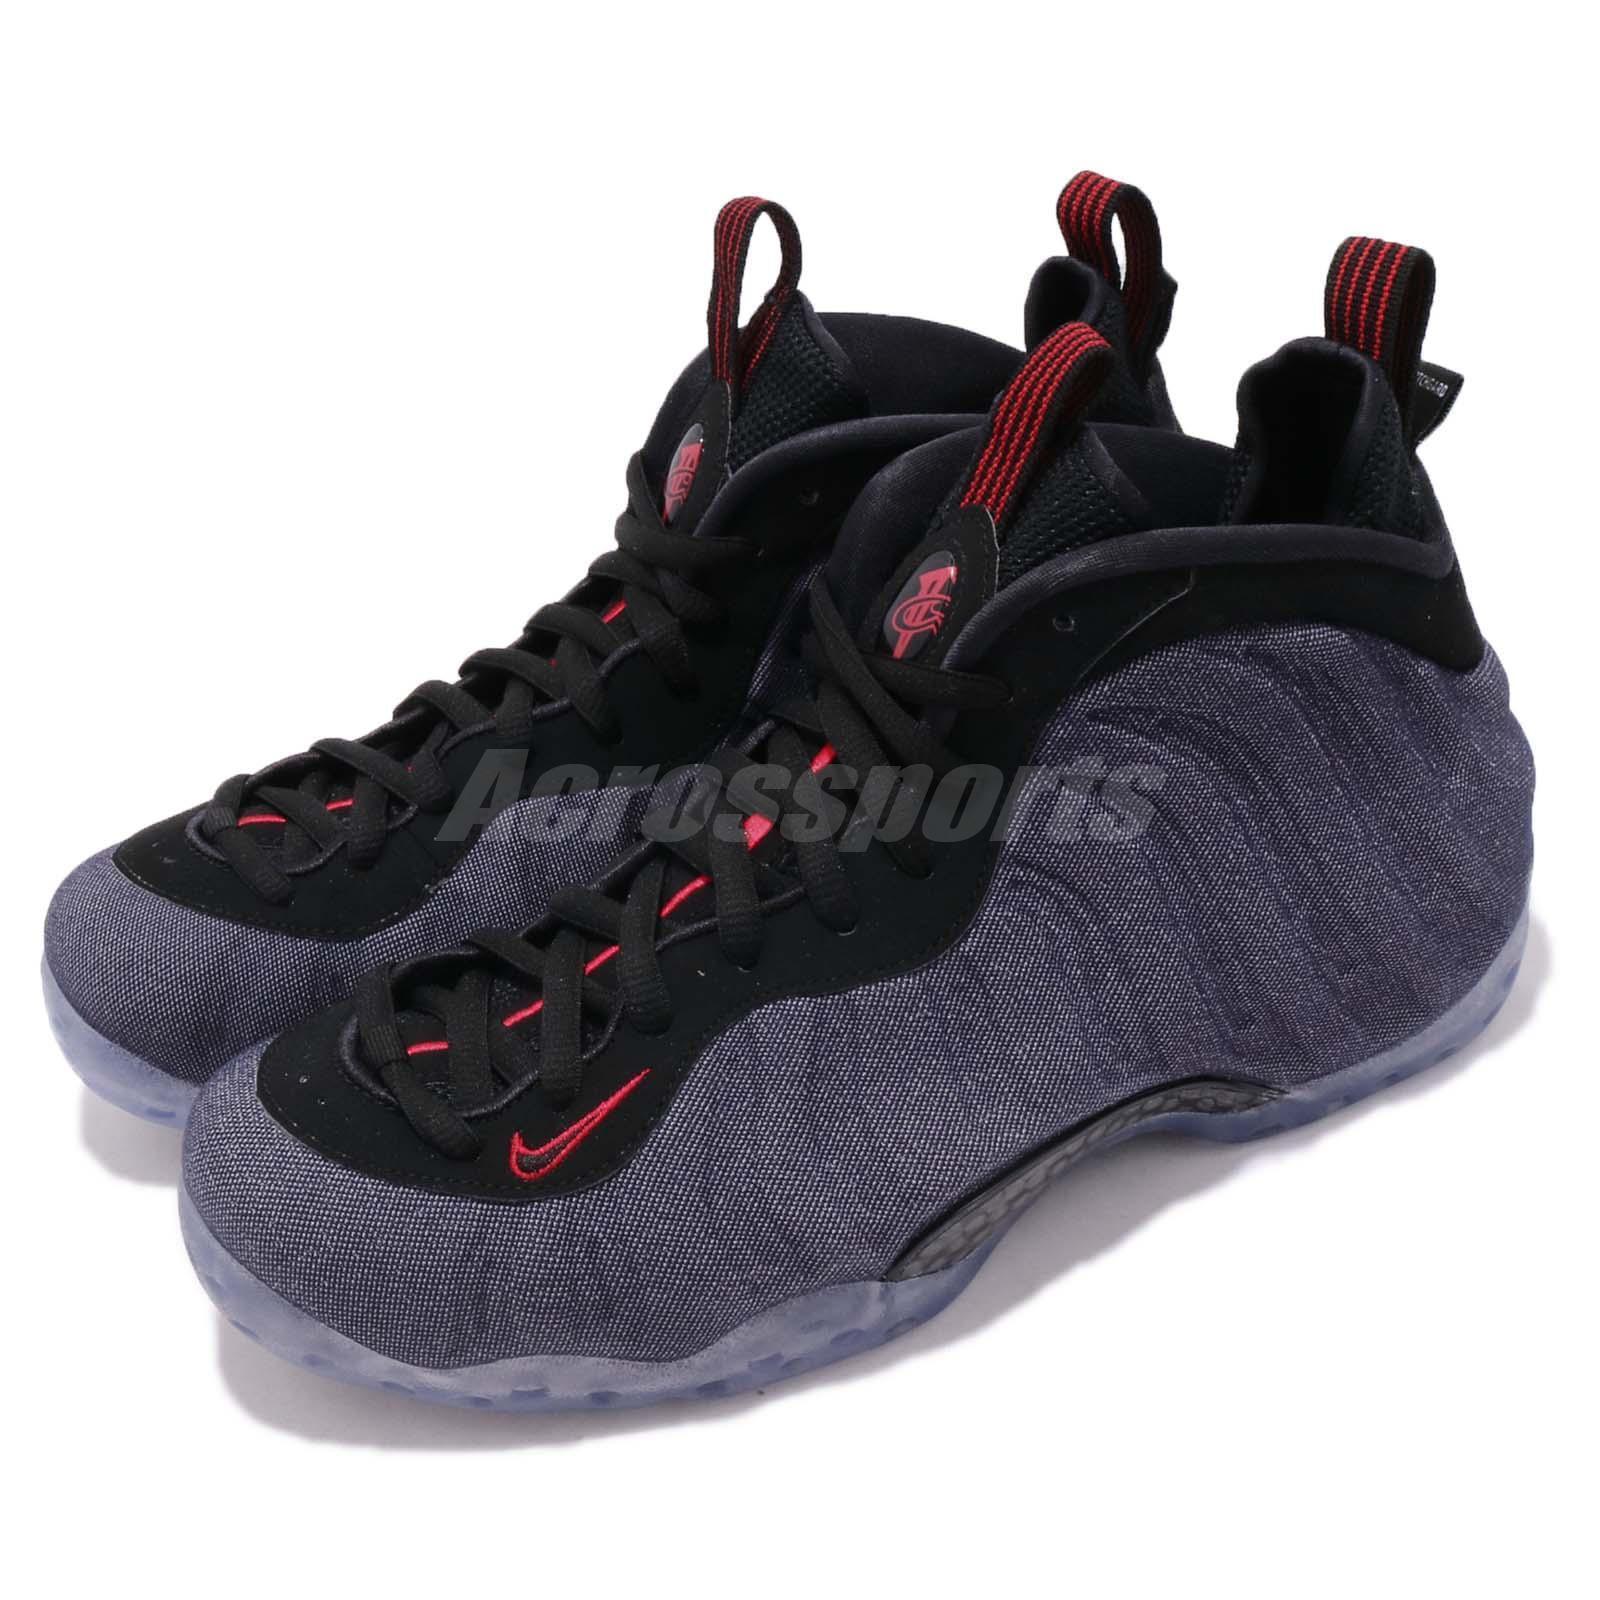 Nike air foamposite 1 / / 1 pro - mens basketball - schuhe penny hardaway holen. 095534